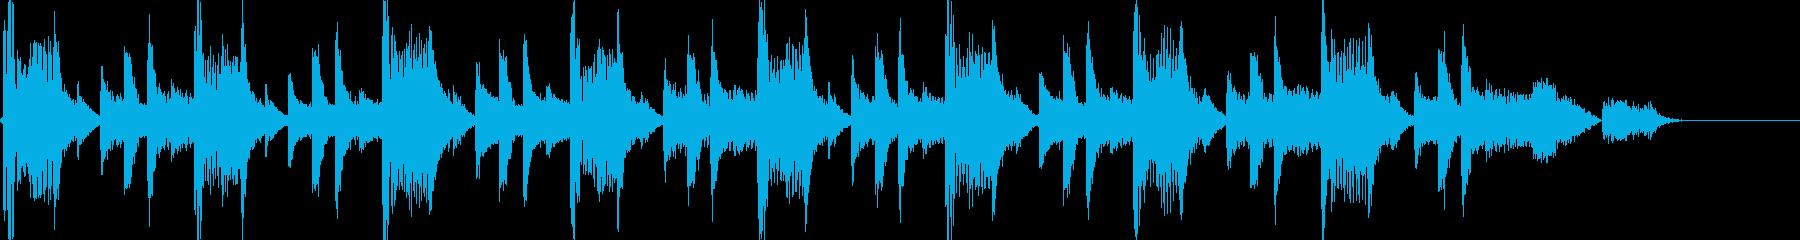 Drum&Bass風のジングルの再生済みの波形